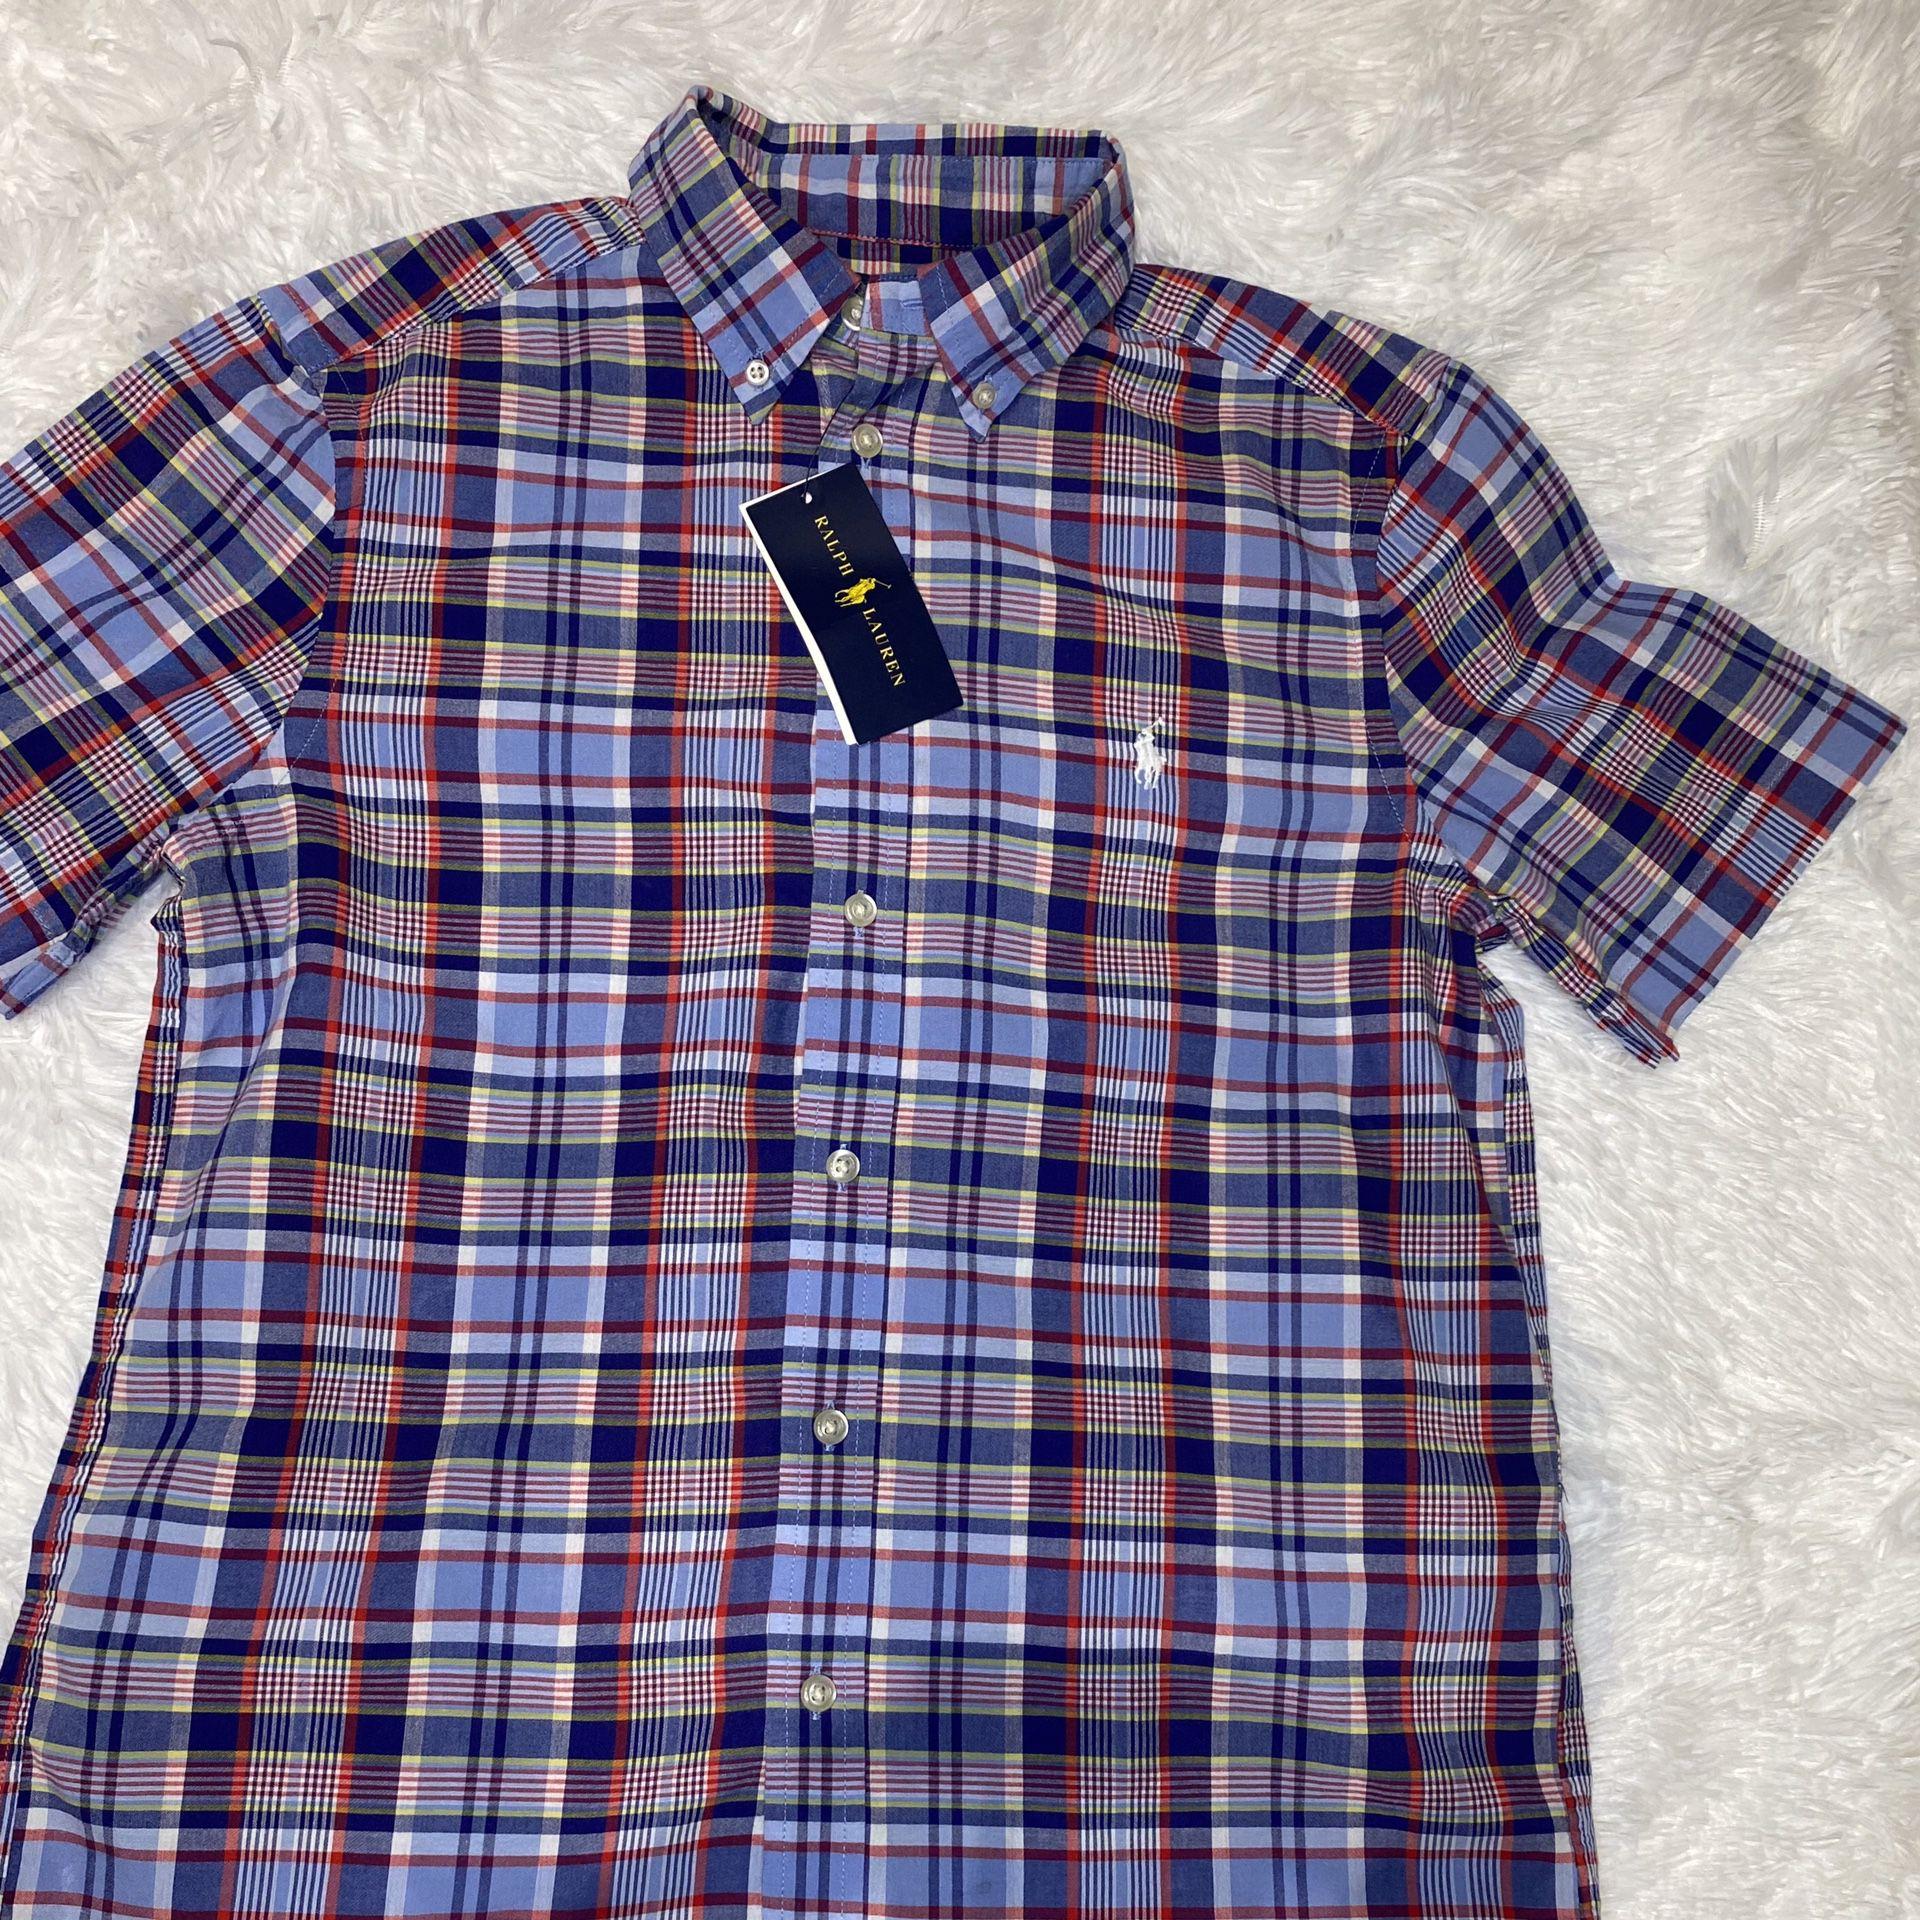 Polo Oxford Shirt Blue Plaid